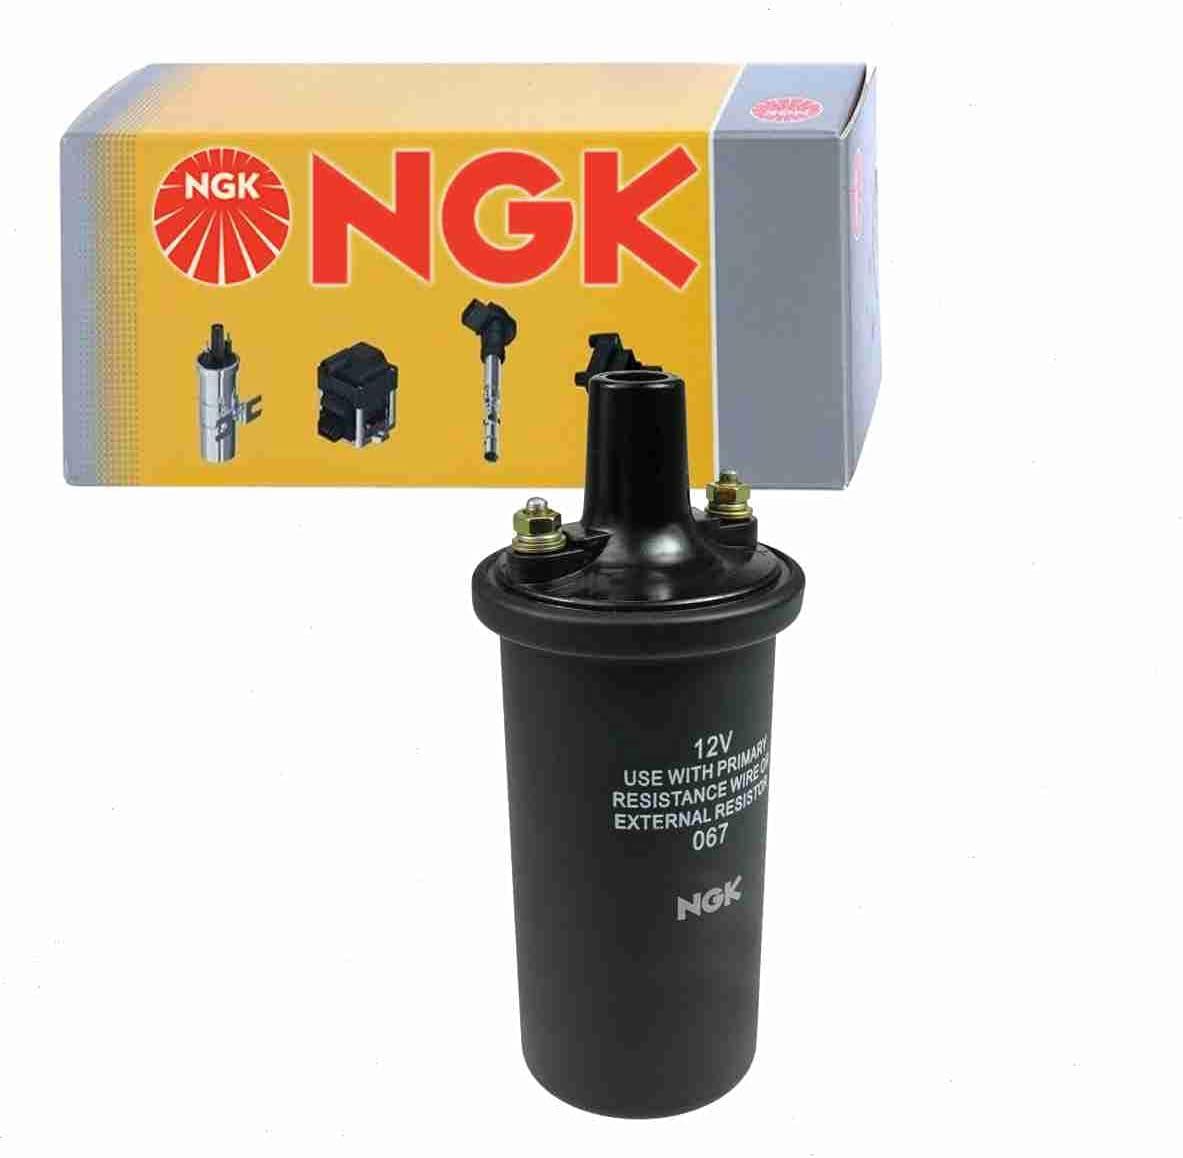 Popular popular NGK Ignition Spring new work Coil compatible with Suzuki Samurai 1.3L 1985-19 L4